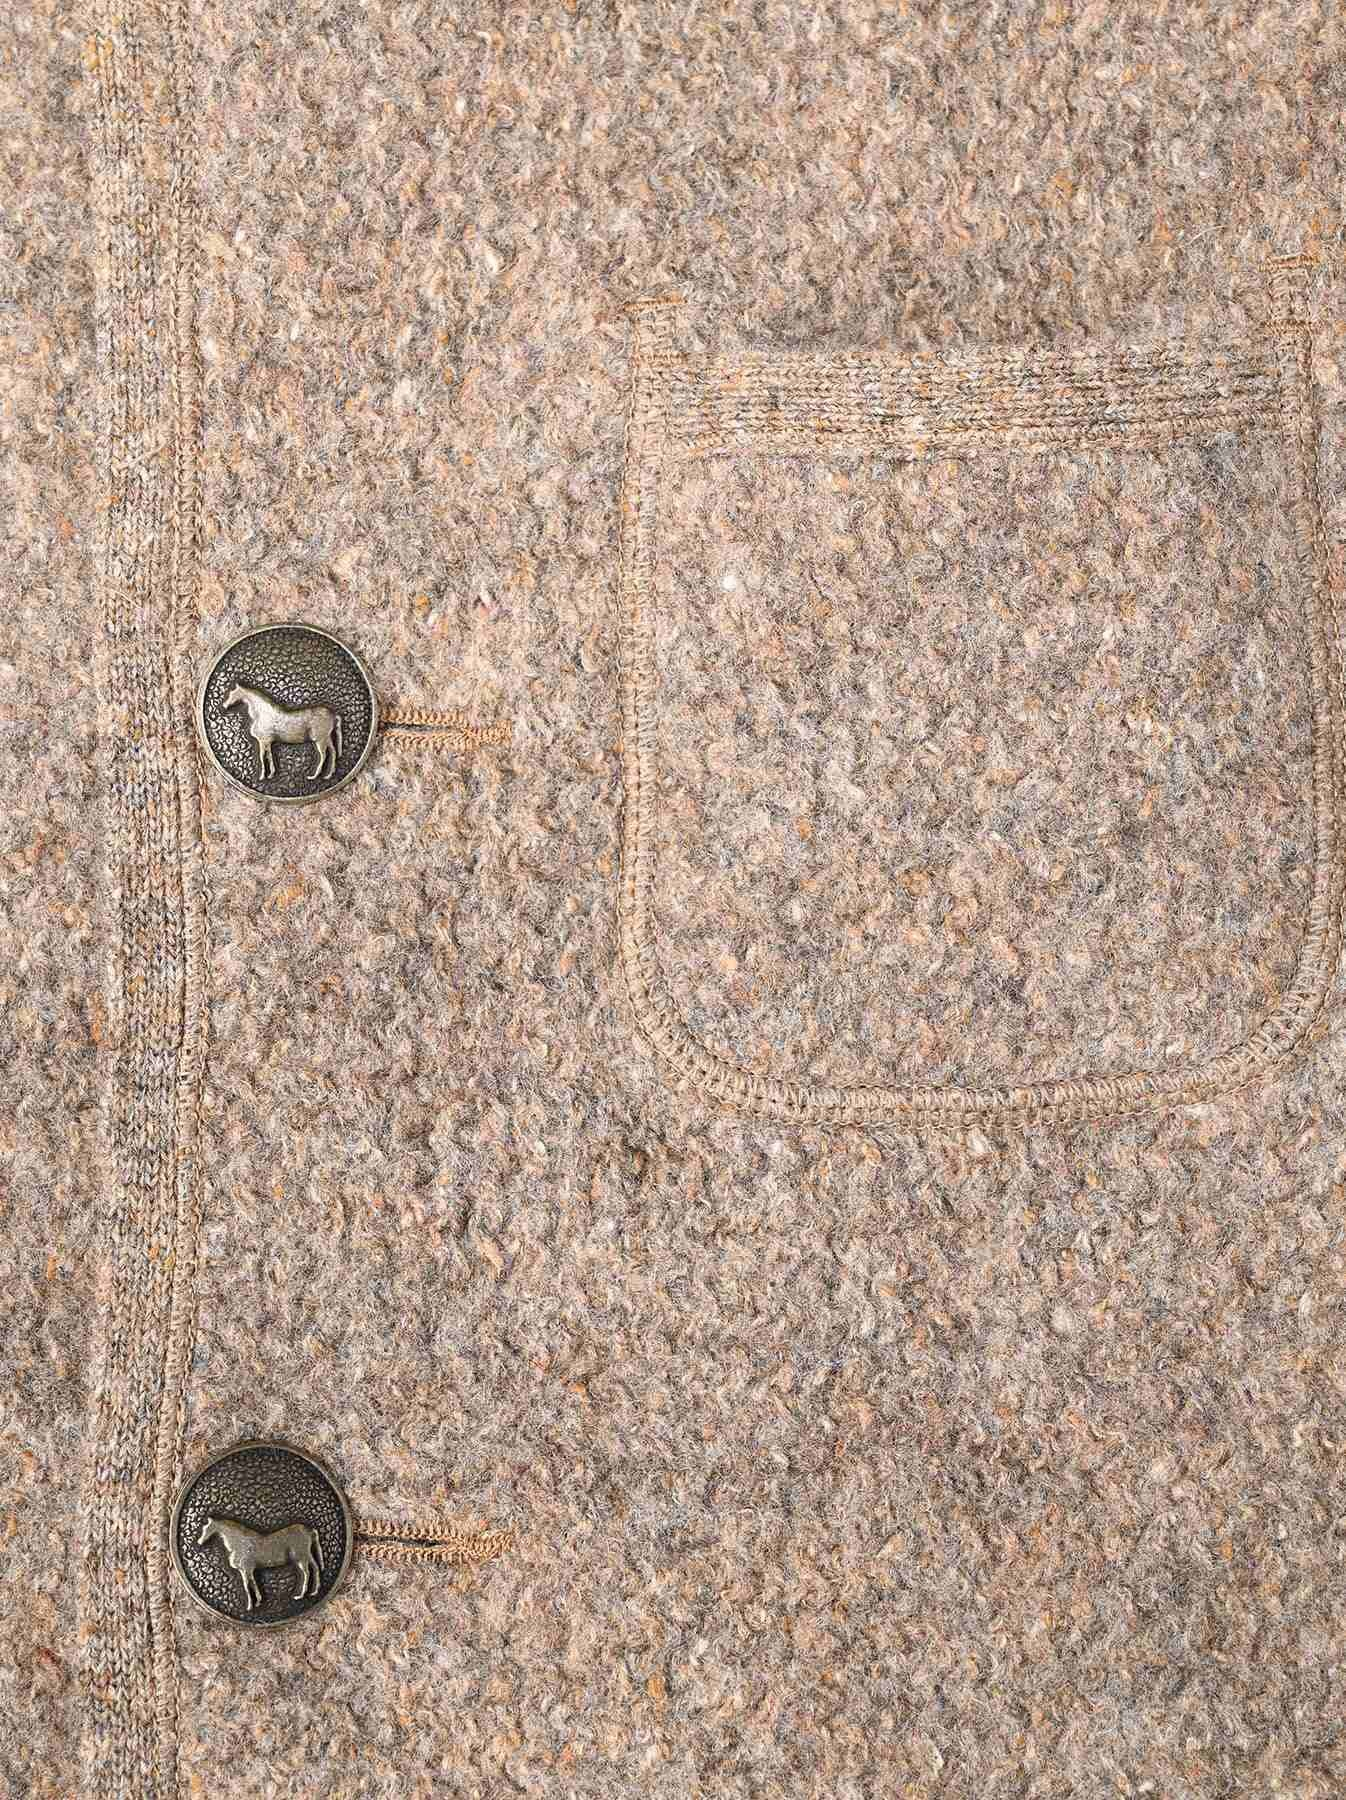 Cotton Shetland 908 Tyrolean Jacket-7